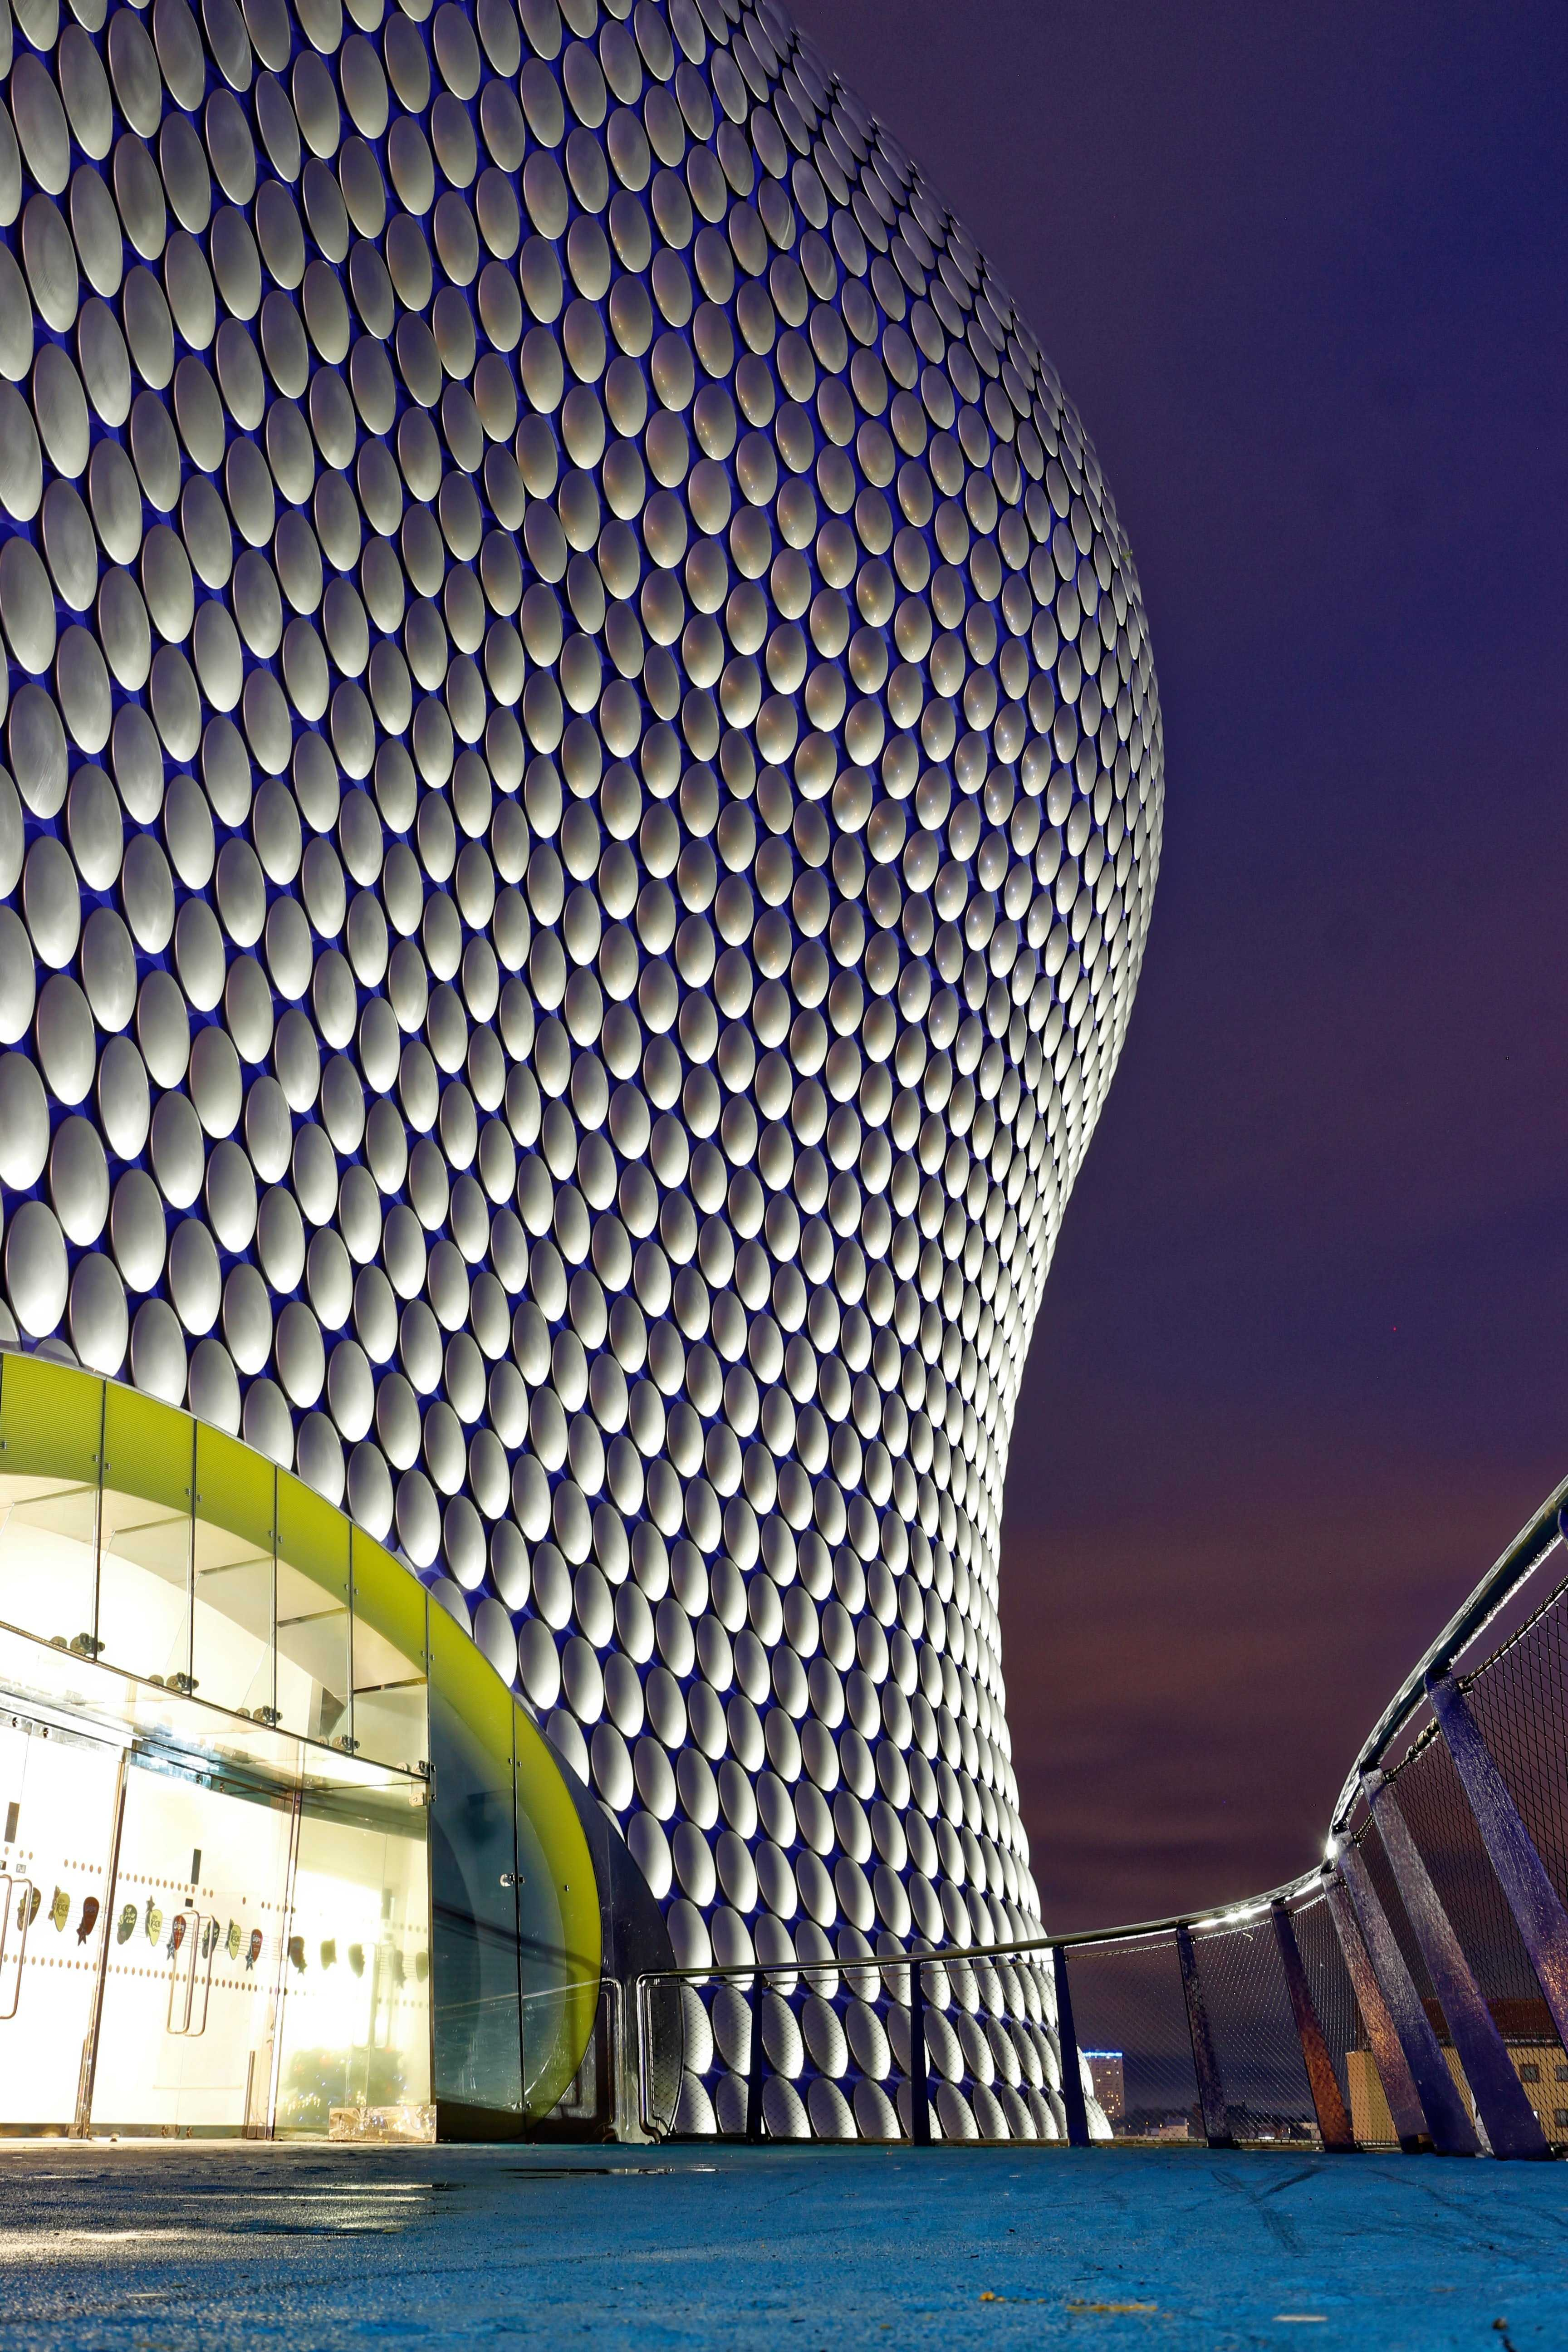 Birmingham City Center